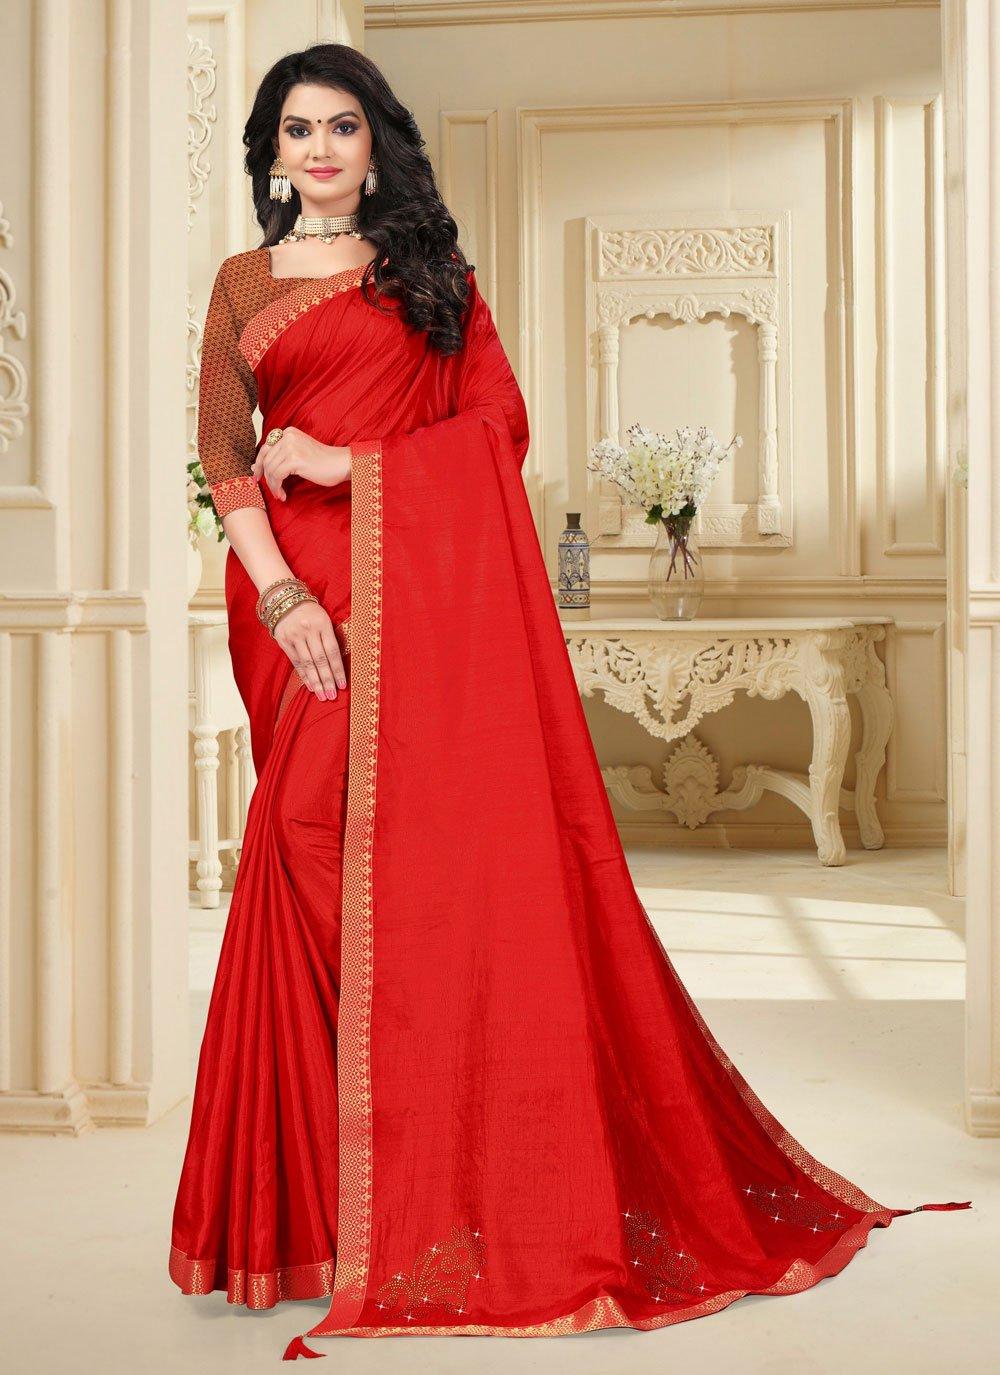 Lace Vichitra Silk Classic Saree in Red